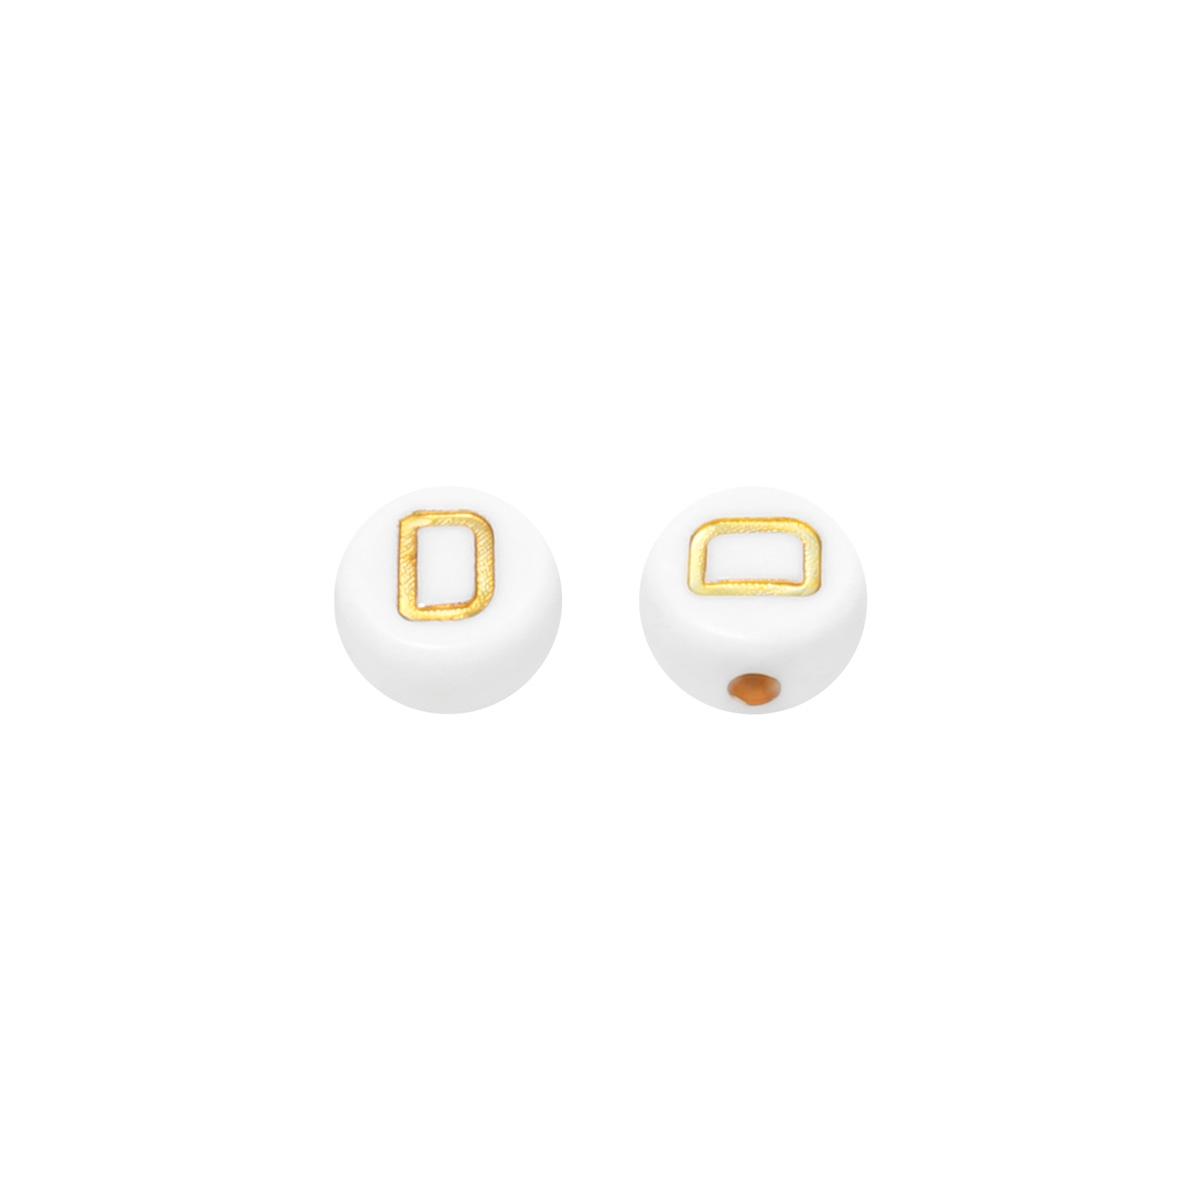 Diy flat beads letter d - 7mm